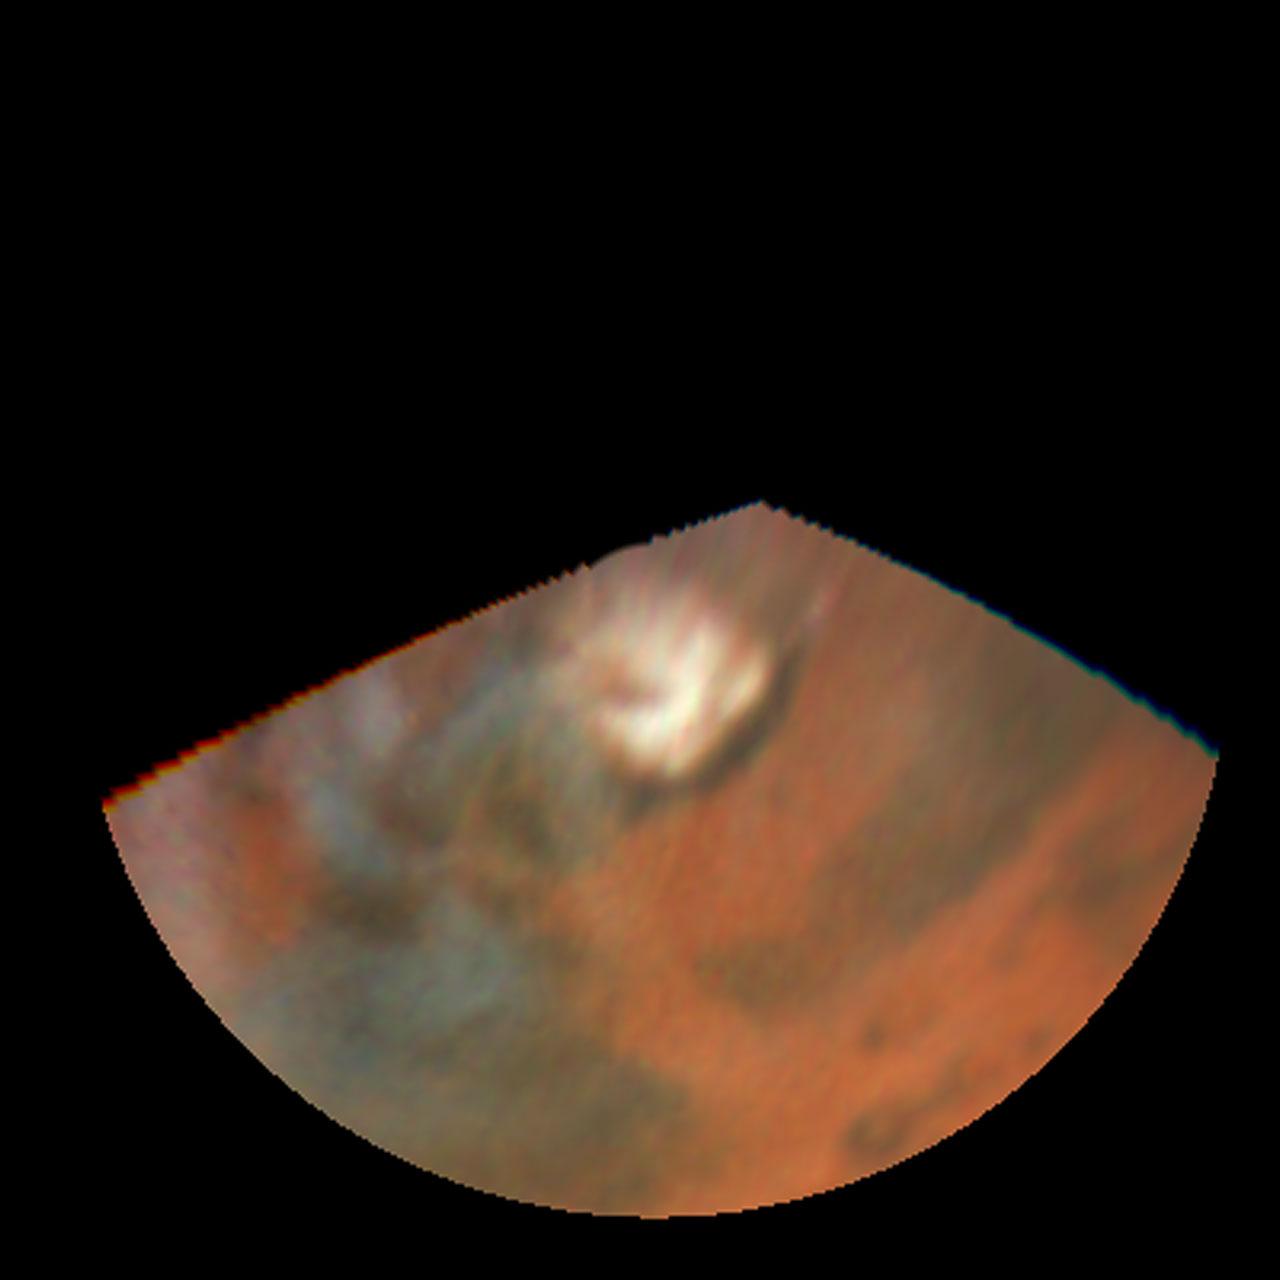 Rapid Weather Change Observerd on Mars